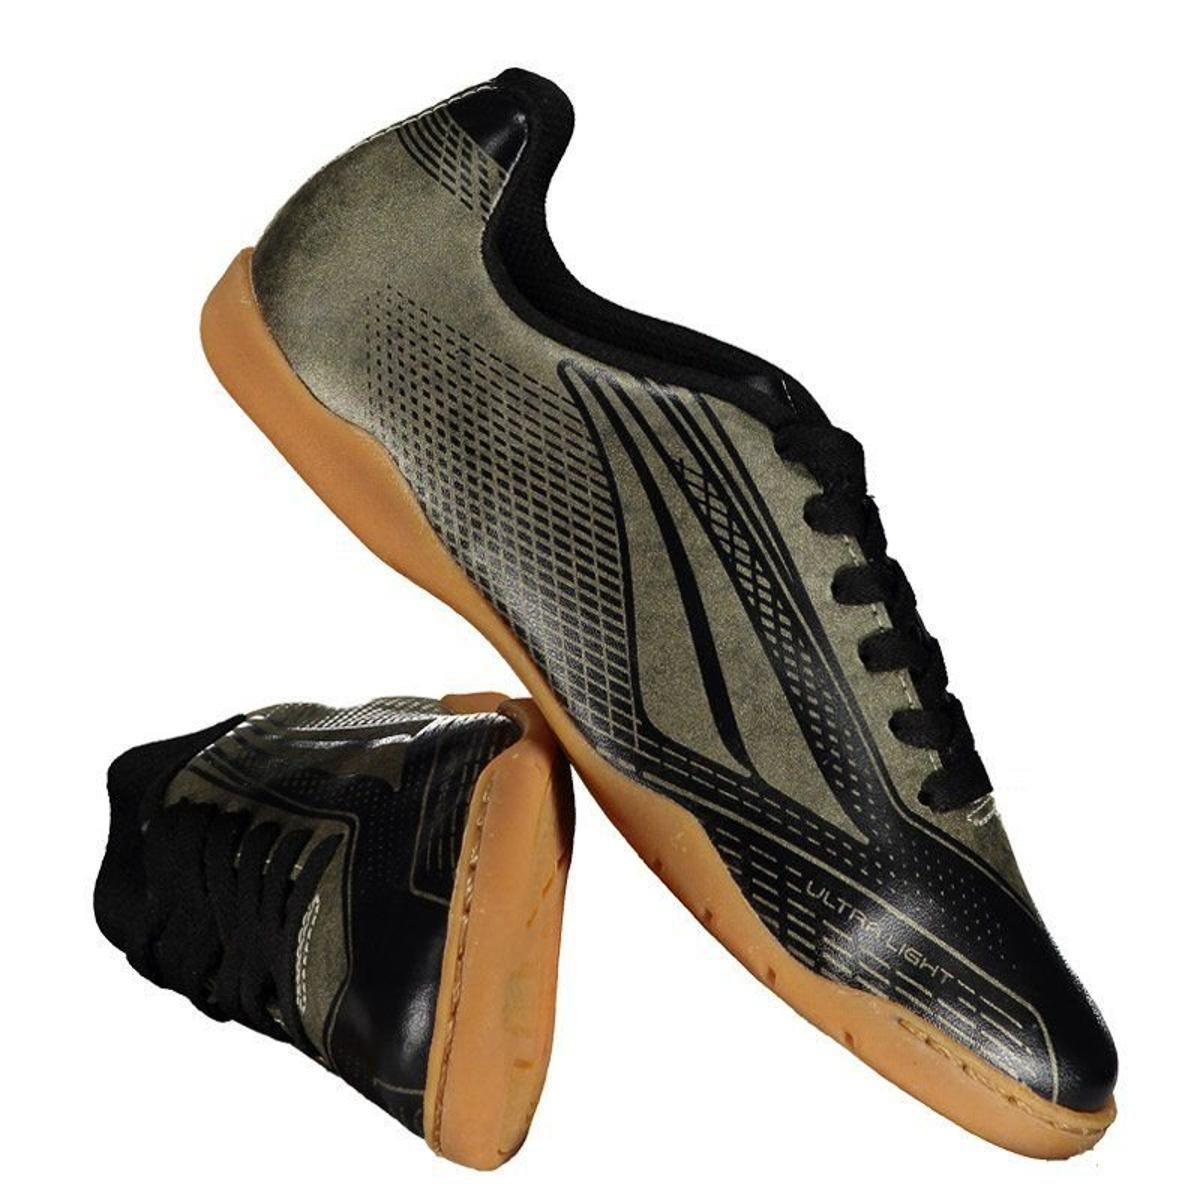 19f95412f8355 Chuteira Penalty Storm Speed VII Futsal Juvenil - Compre Agora ...